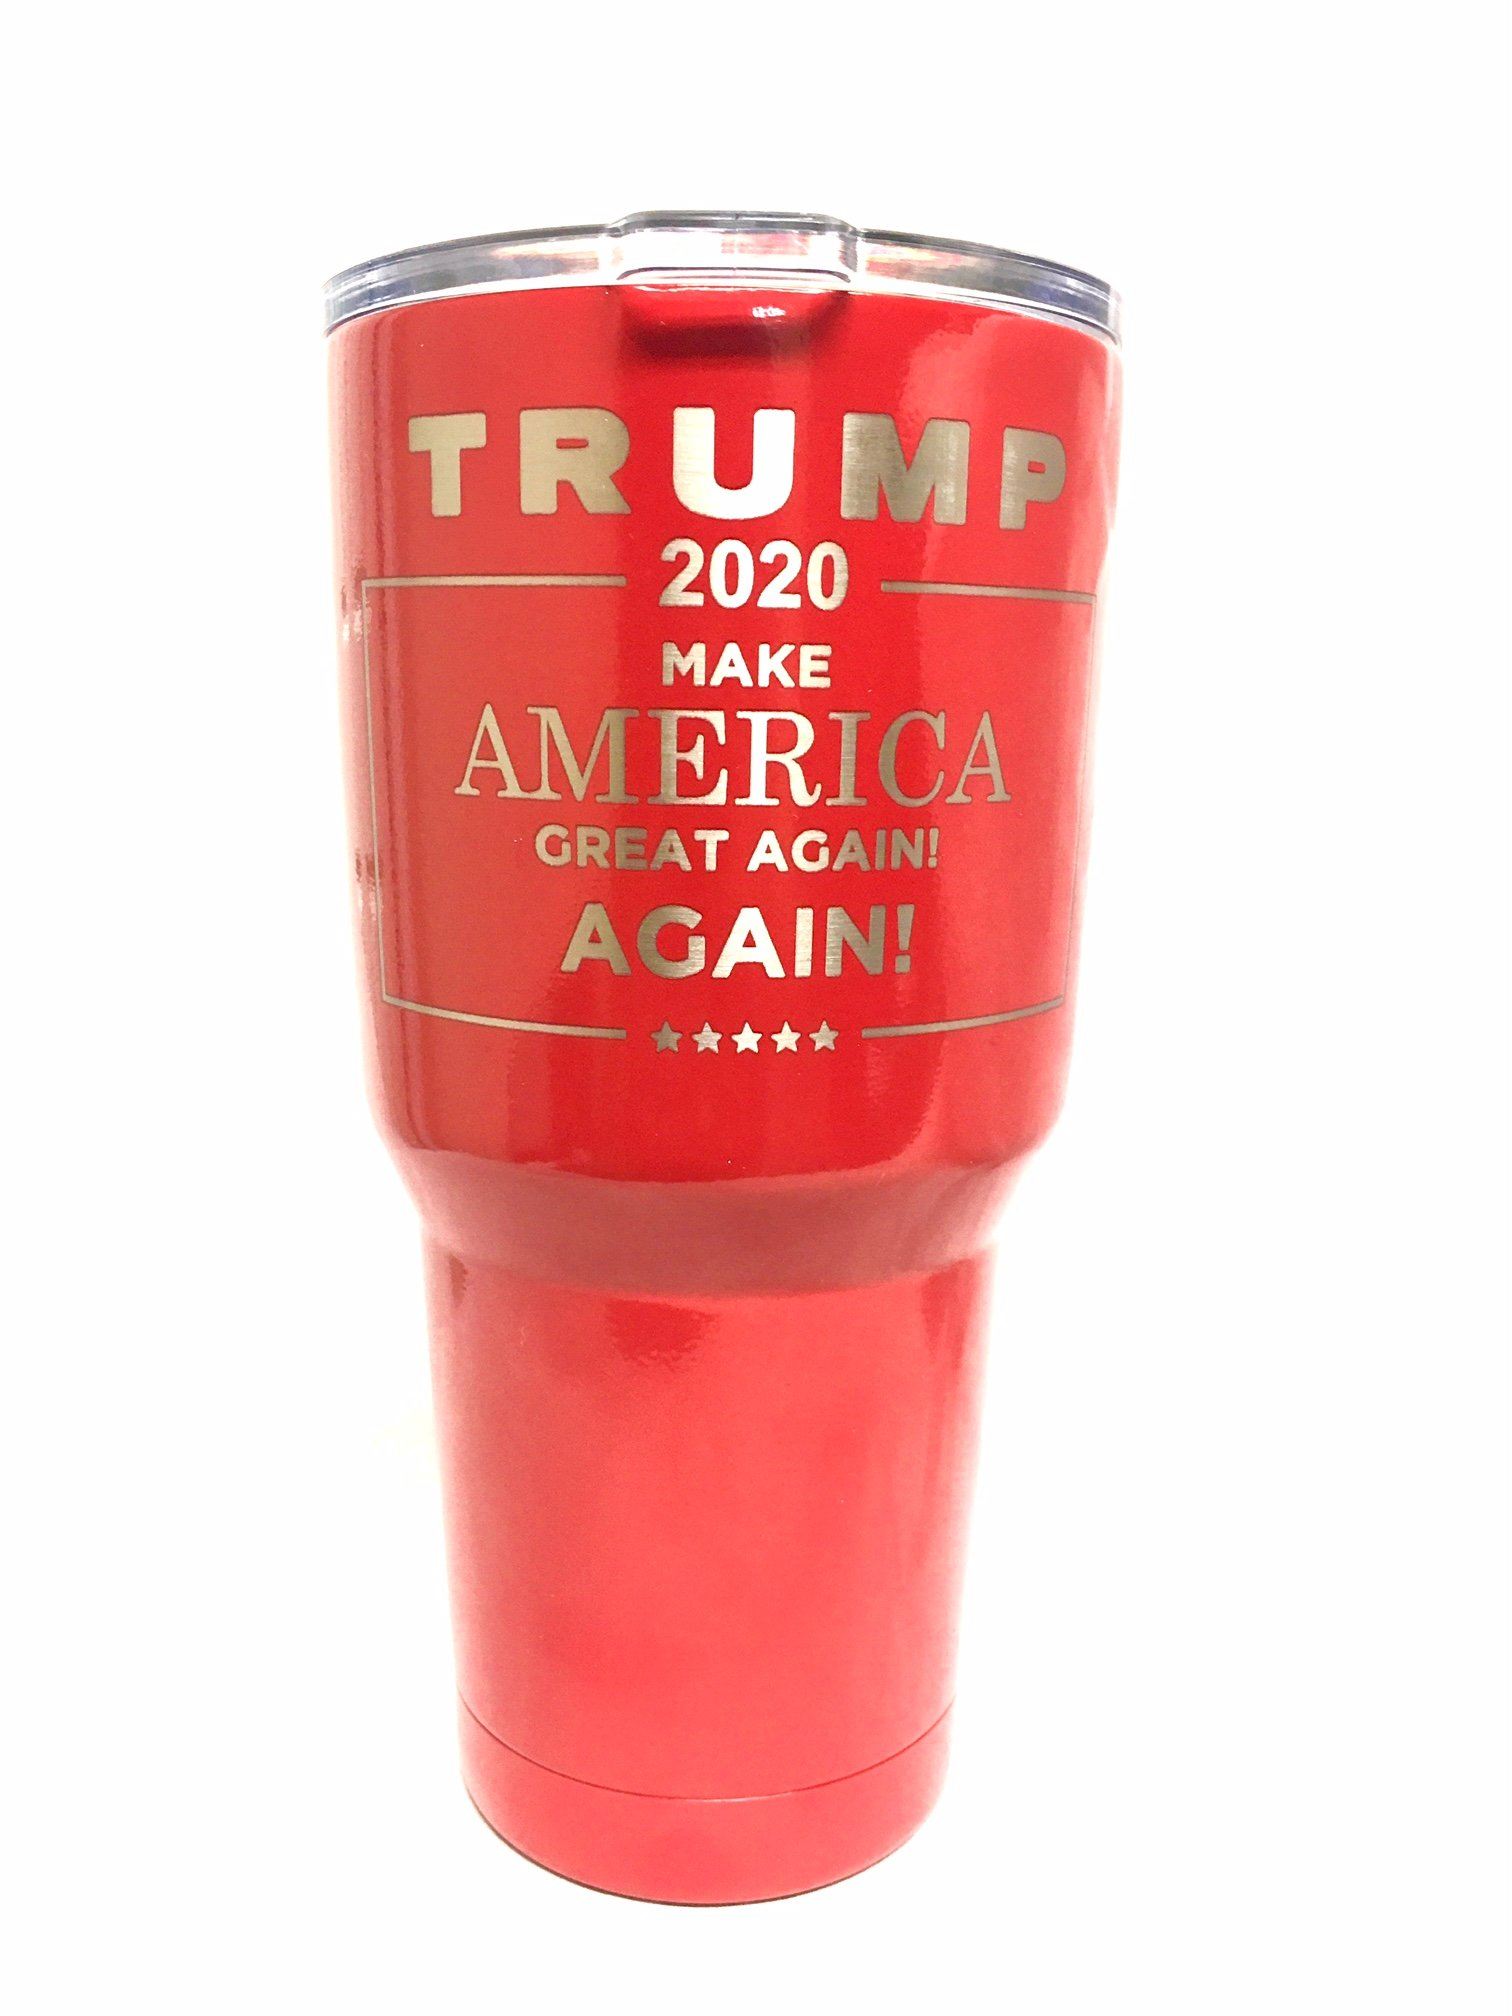 Trump 2020 Make America Great Again Again 30 oz Insulated Tumbler